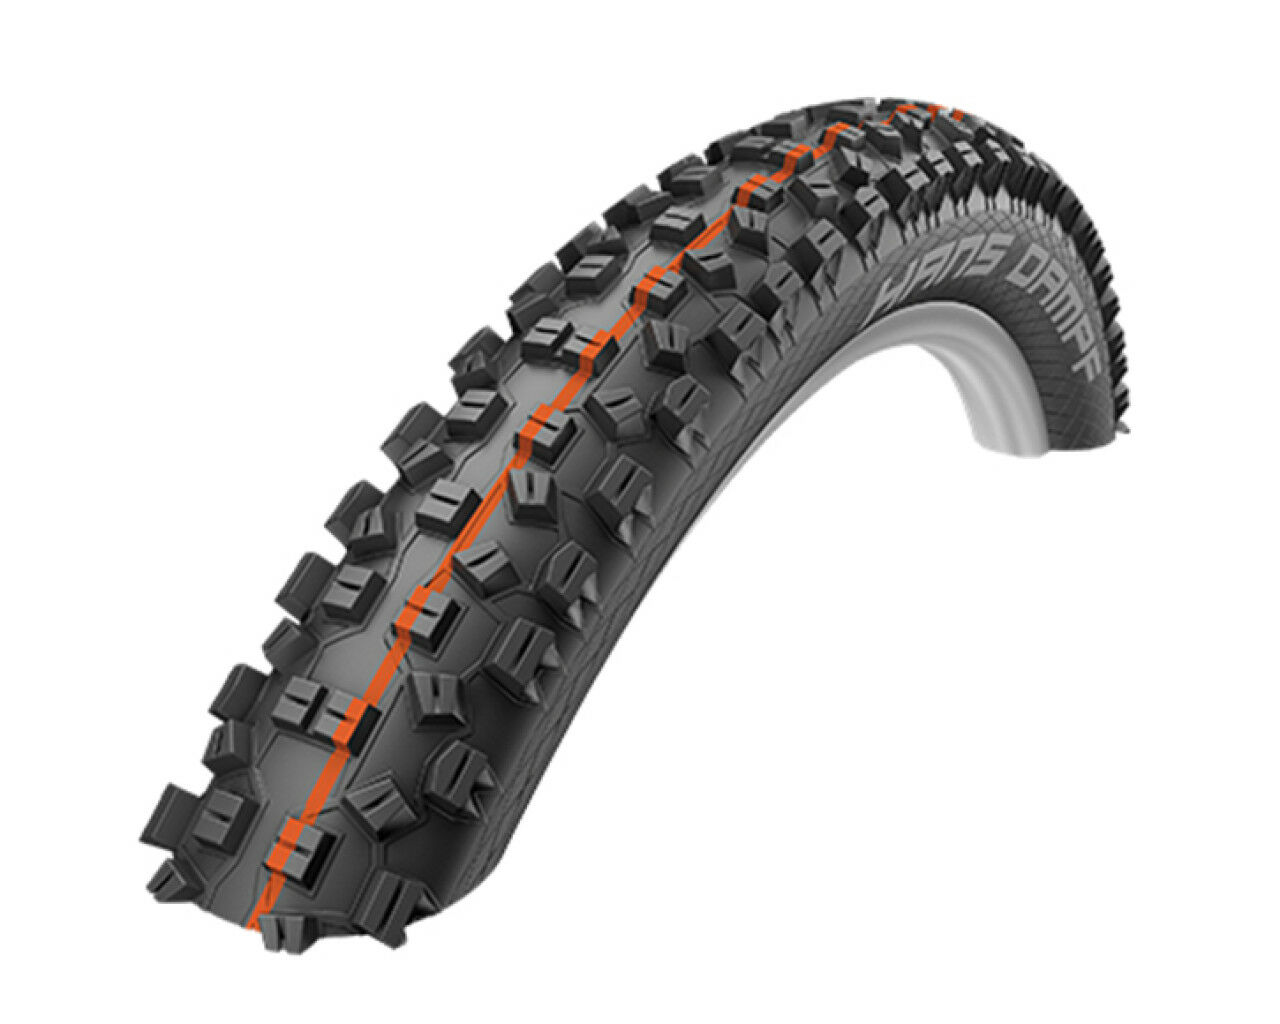 Schwalbe Addix Hans Dampf Evo  Soft SnakeSkin TL-Easy Folding Tyre 27.5 x 2.25  support wholesale retail